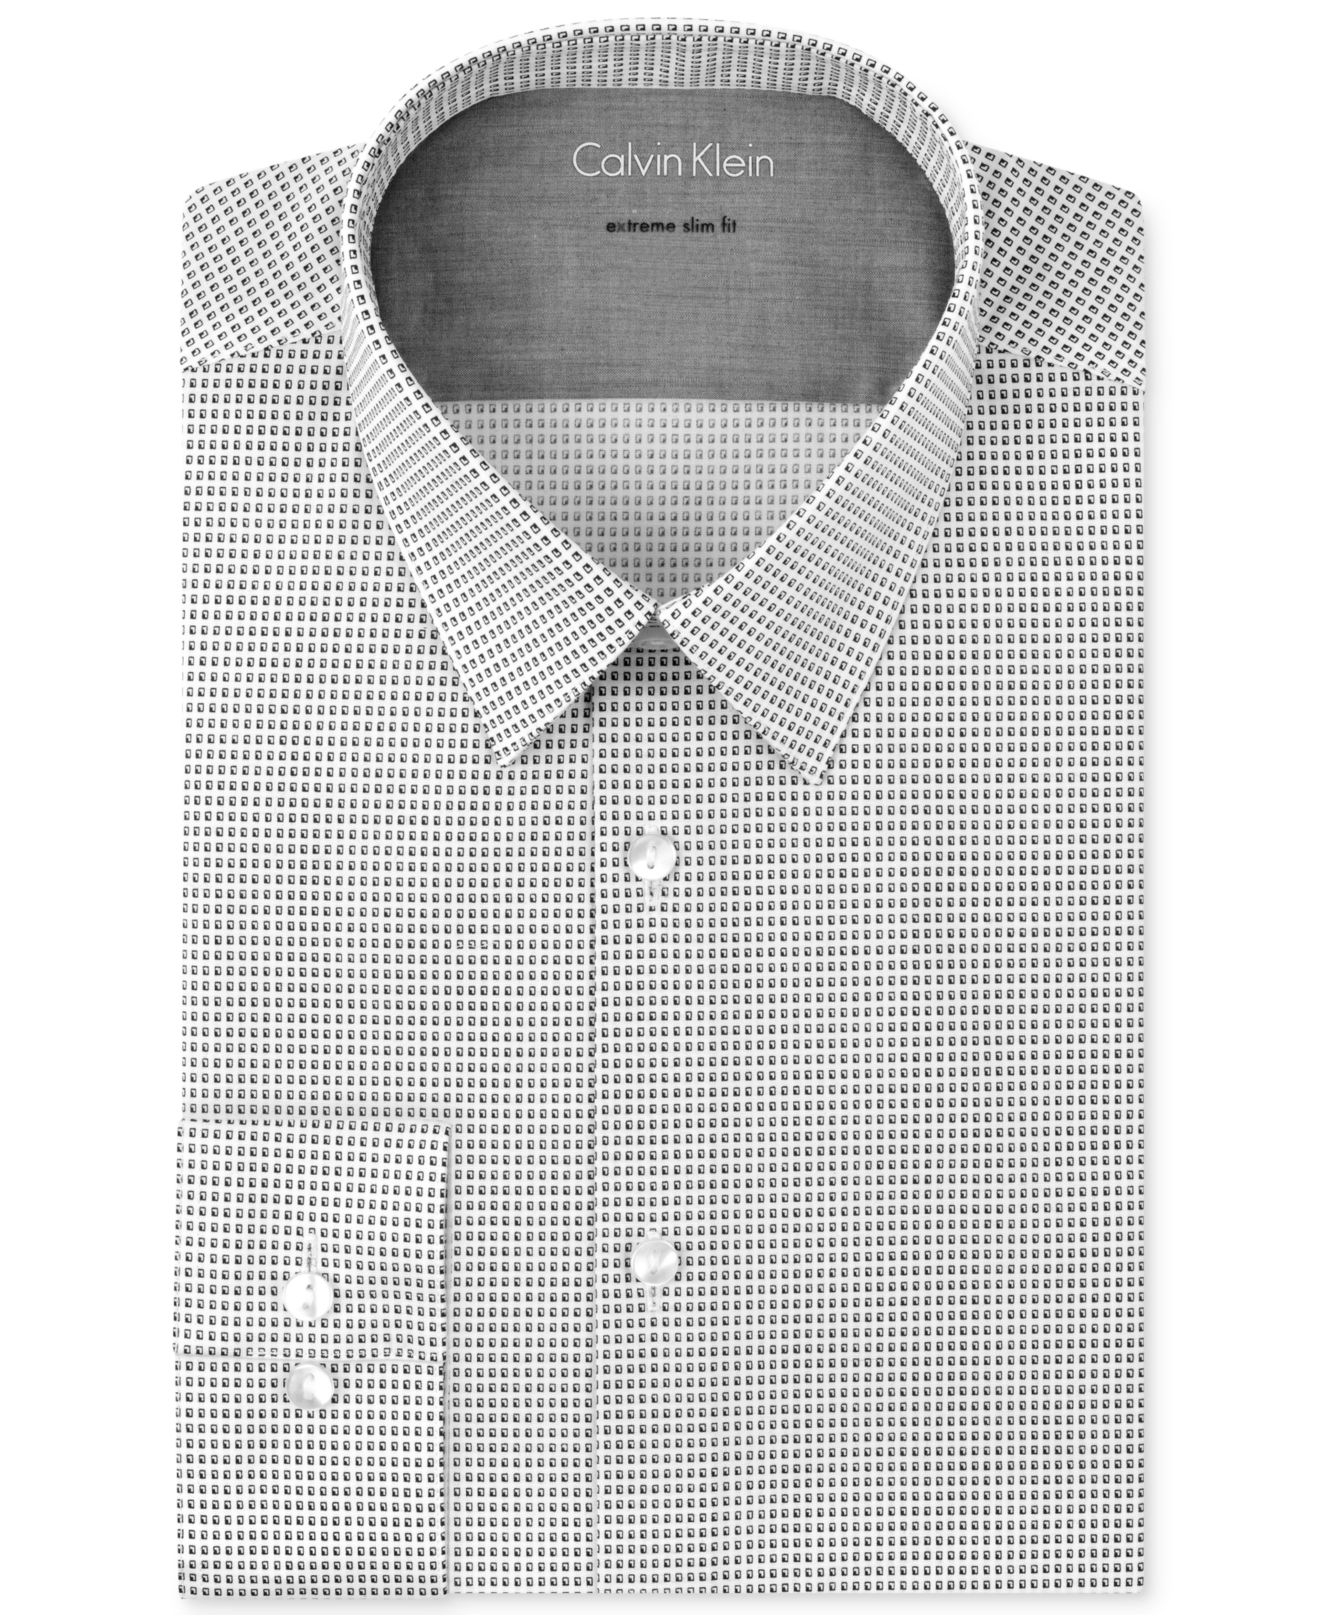 Calvin klein x extra slim shadow geo print dress shirt in for Calvin klein x fit dress shirt